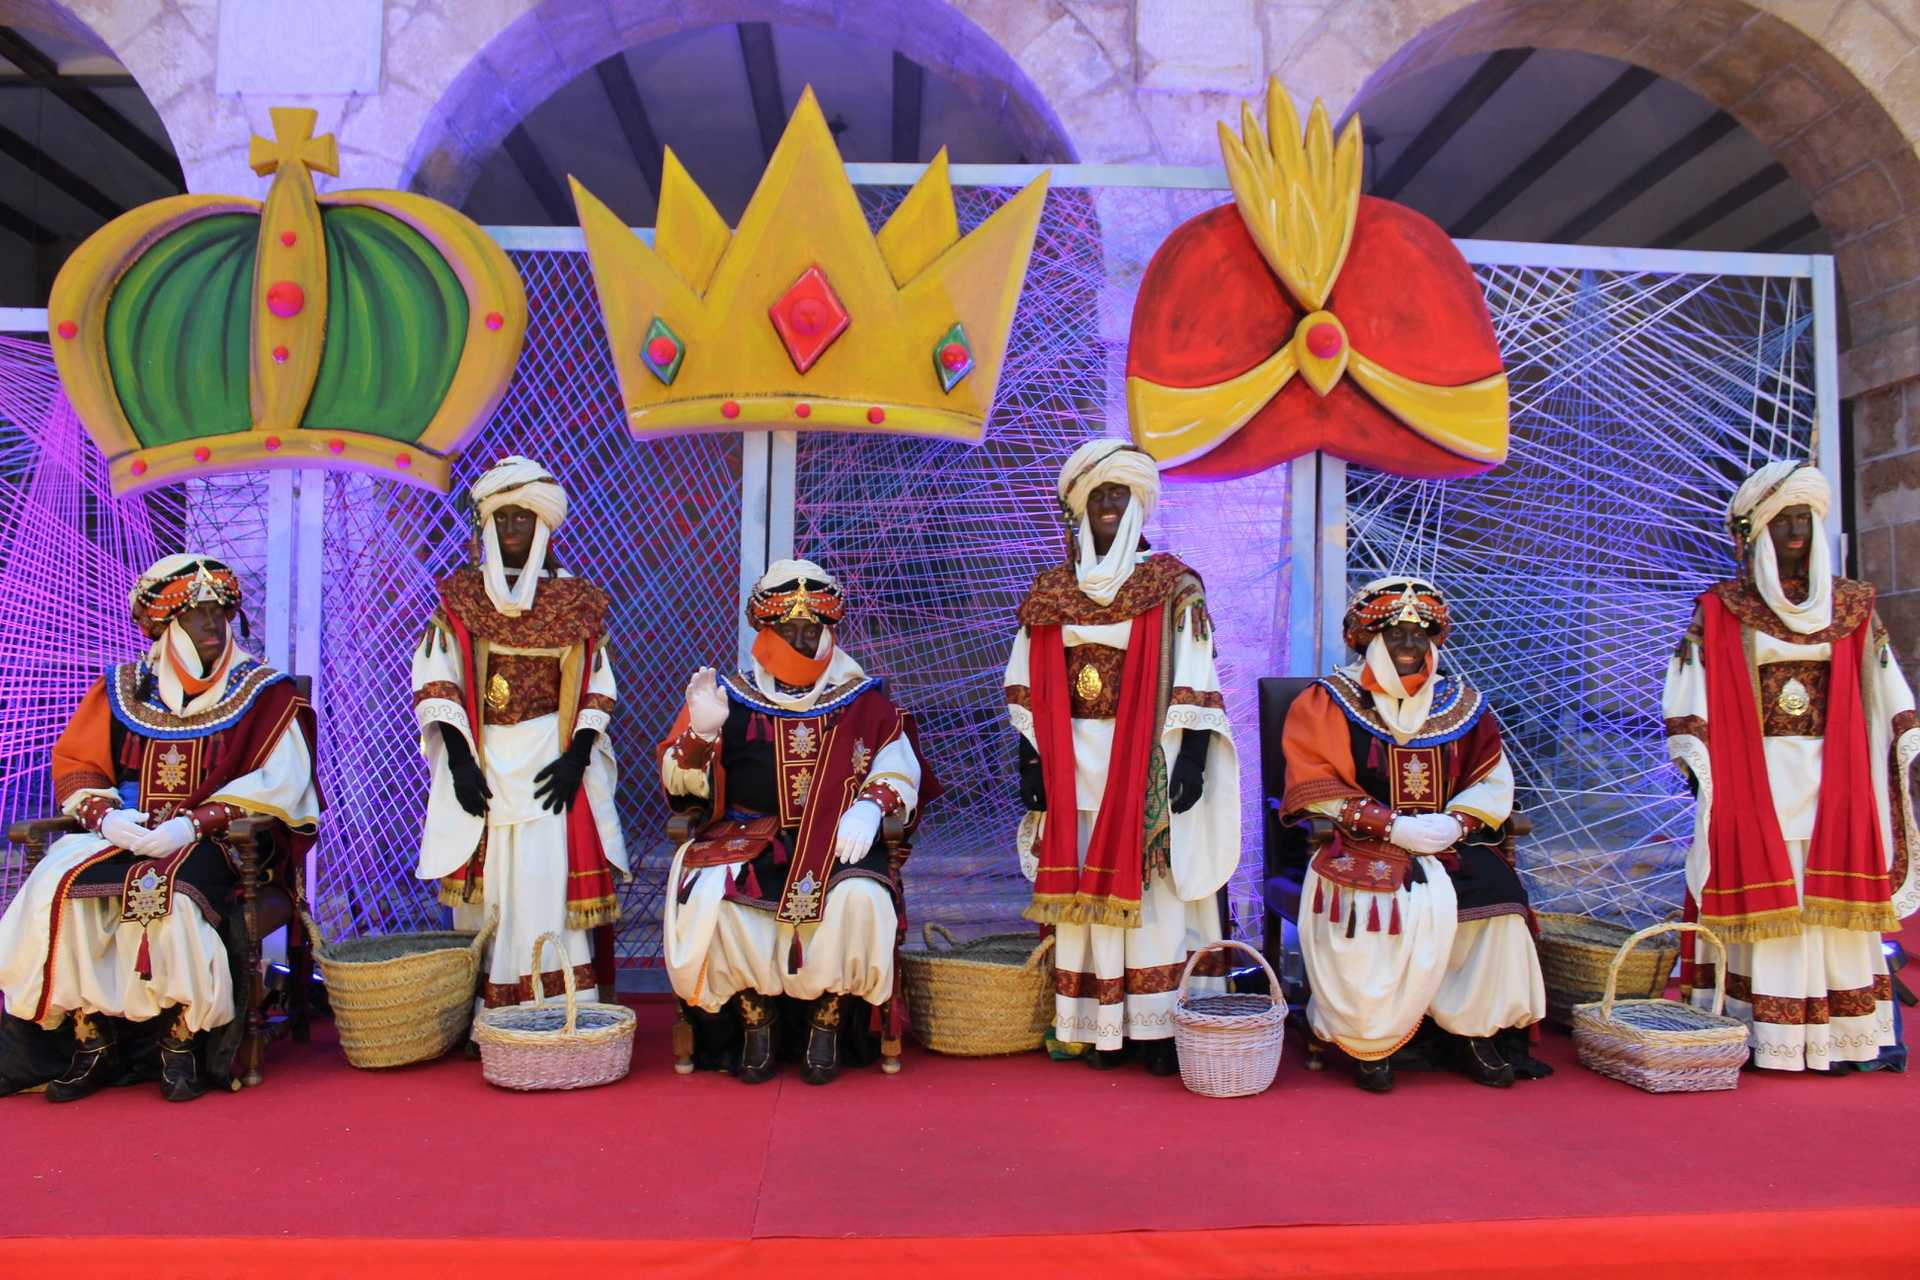 Fest Der Heiligen Drei Königen